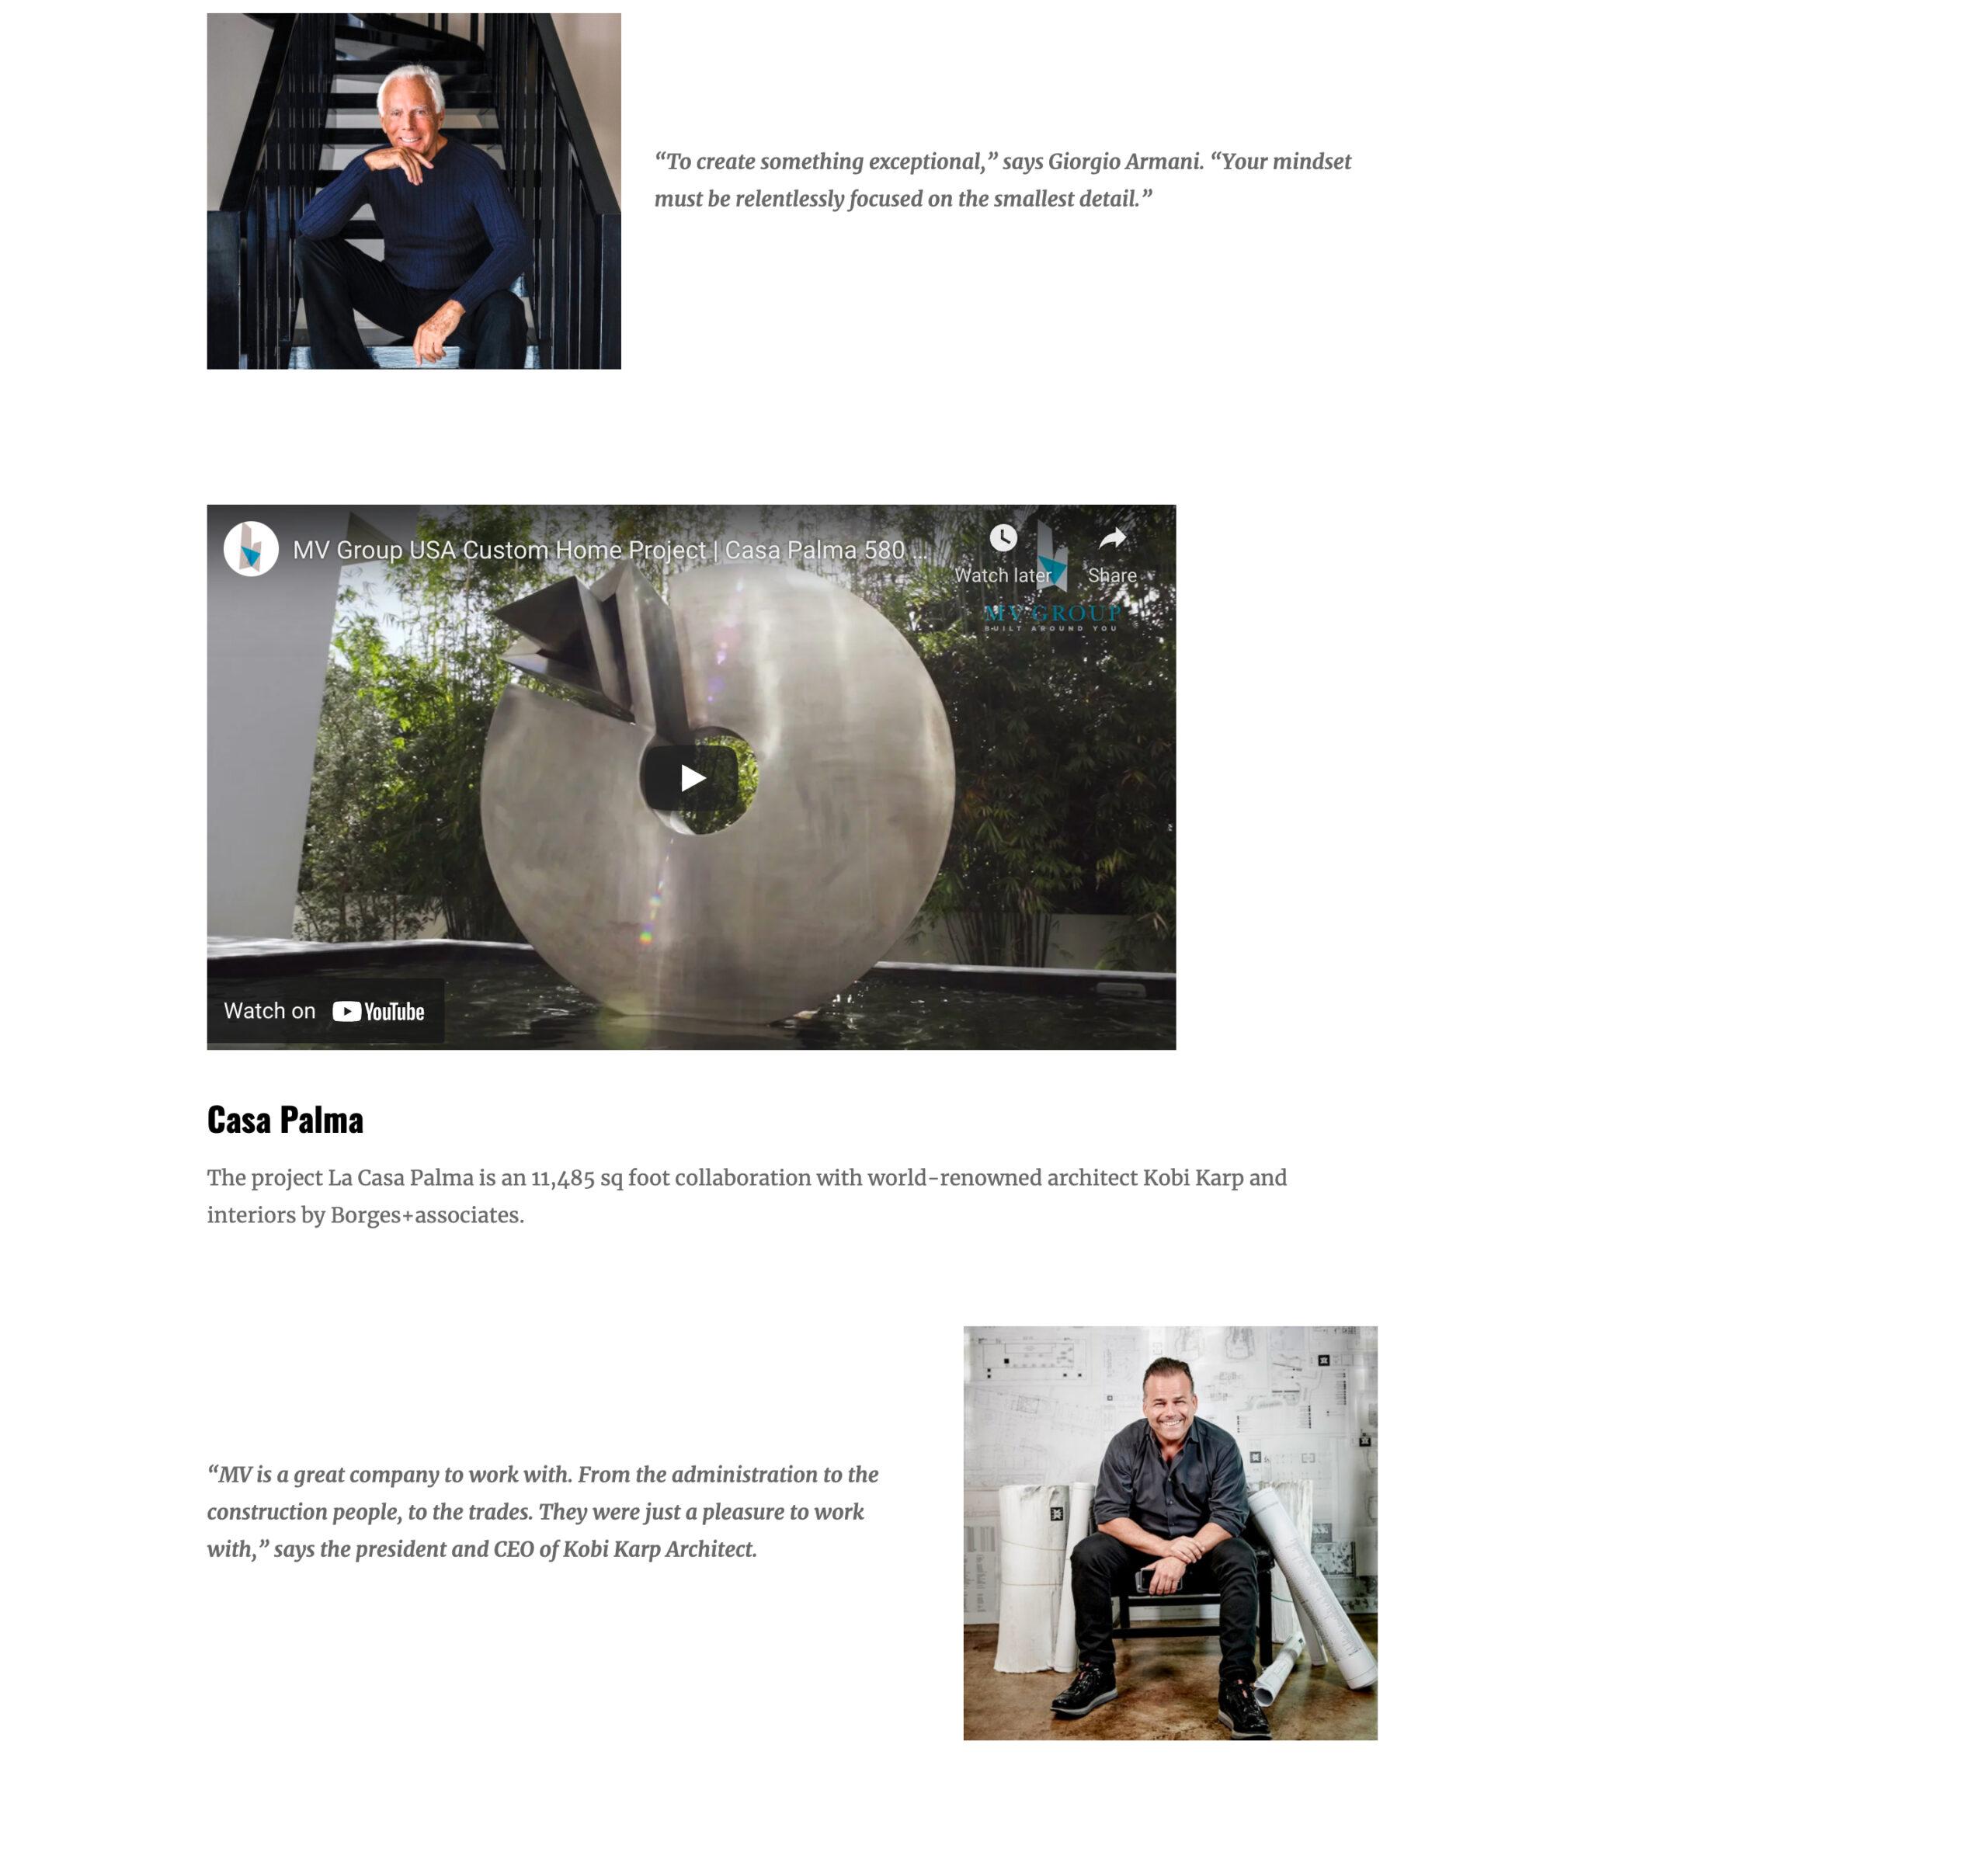 Haute Residence – Seeking Perfection, World's Top Designers Flock To MV Group USA